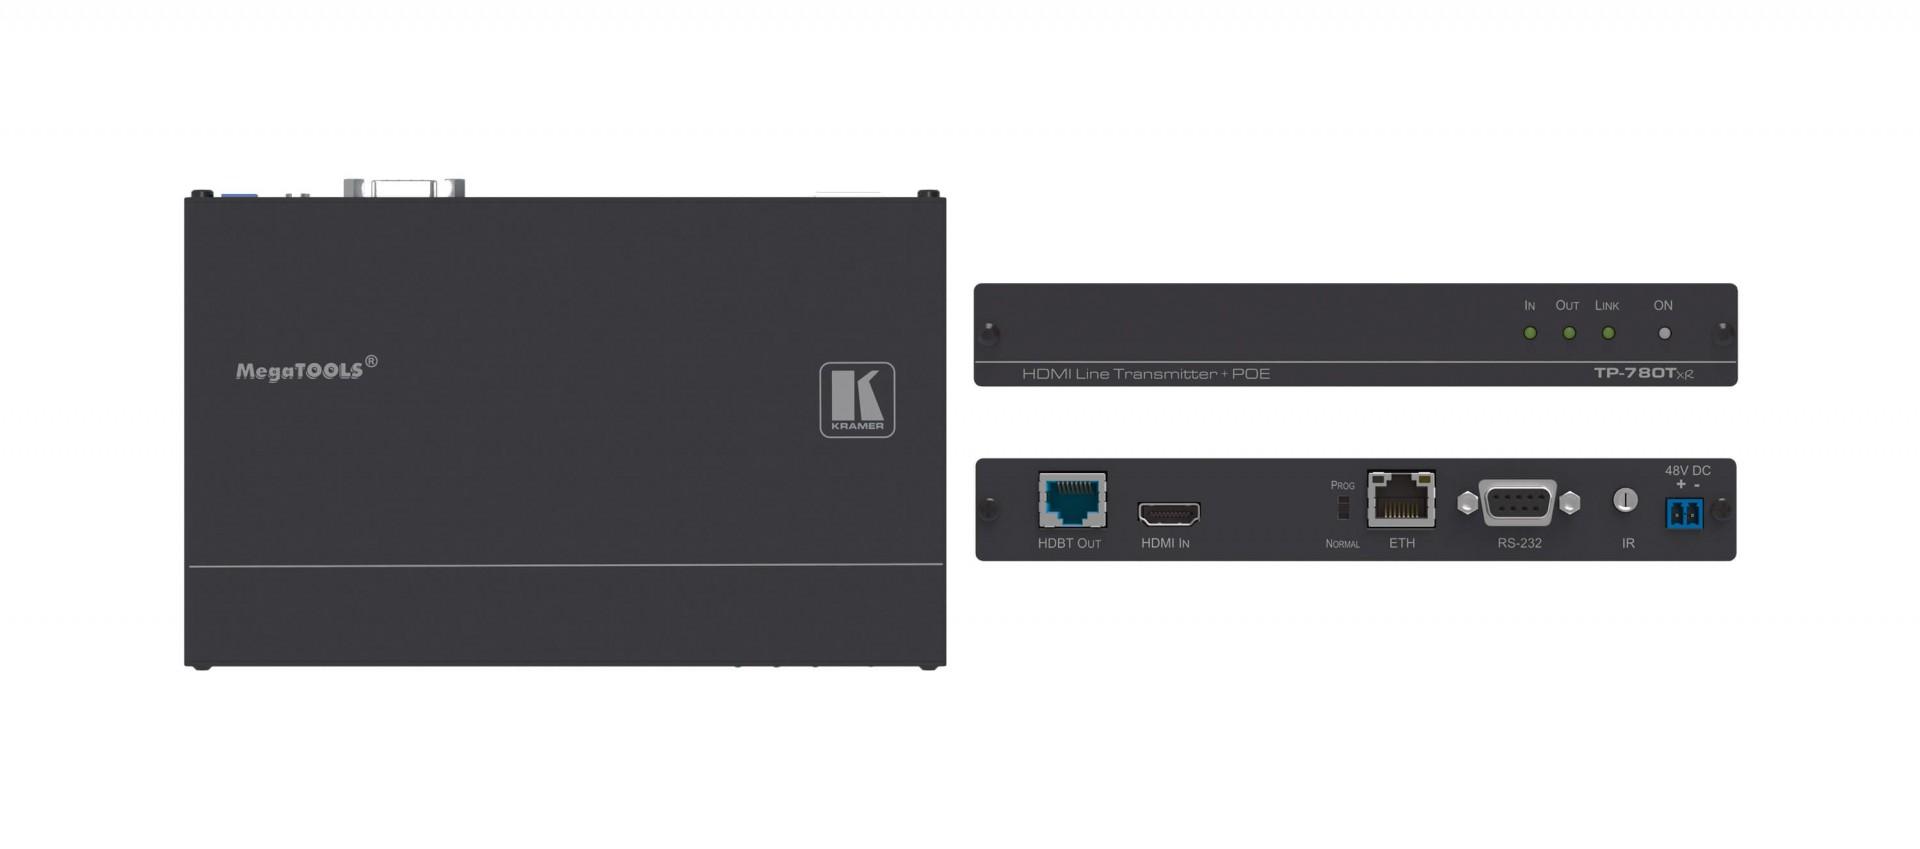 Kramer TP-780Txr - 4K60 4:2:0 HDMI HDCP 2.2 PoE Transmitter